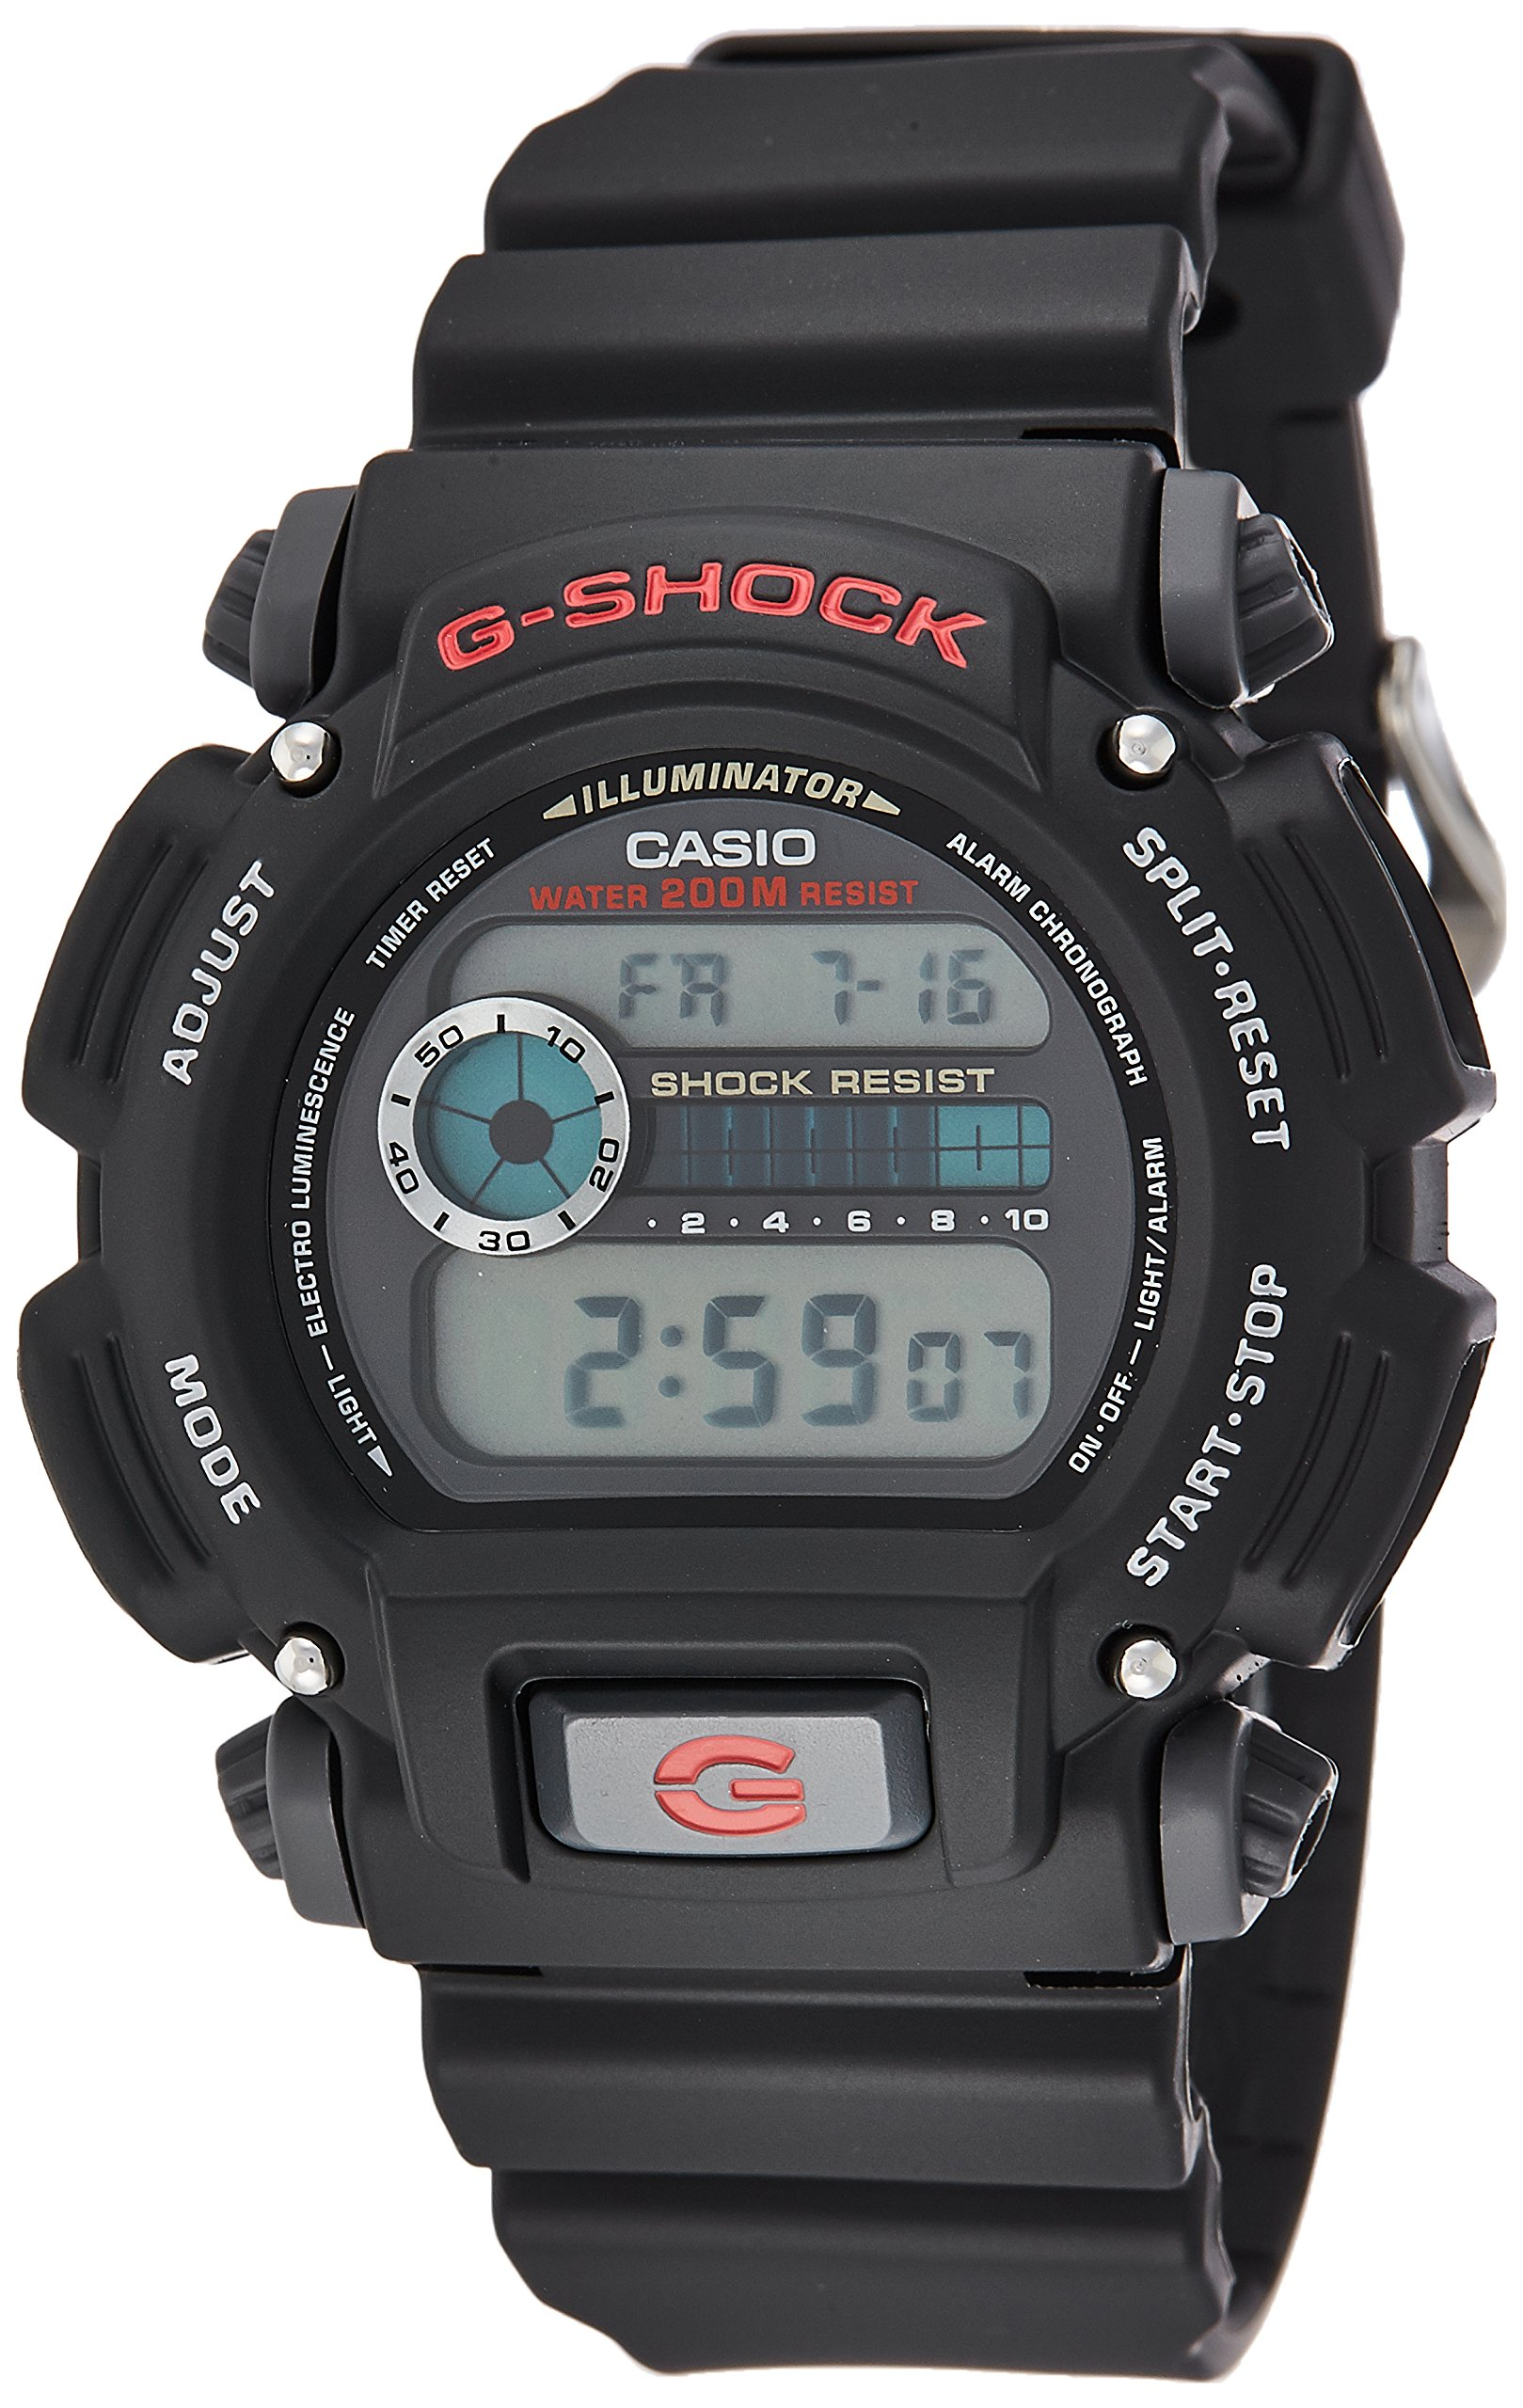 Casio Men's G-shock DW9052-1V Shock Resistant Black Resin Sport Watch